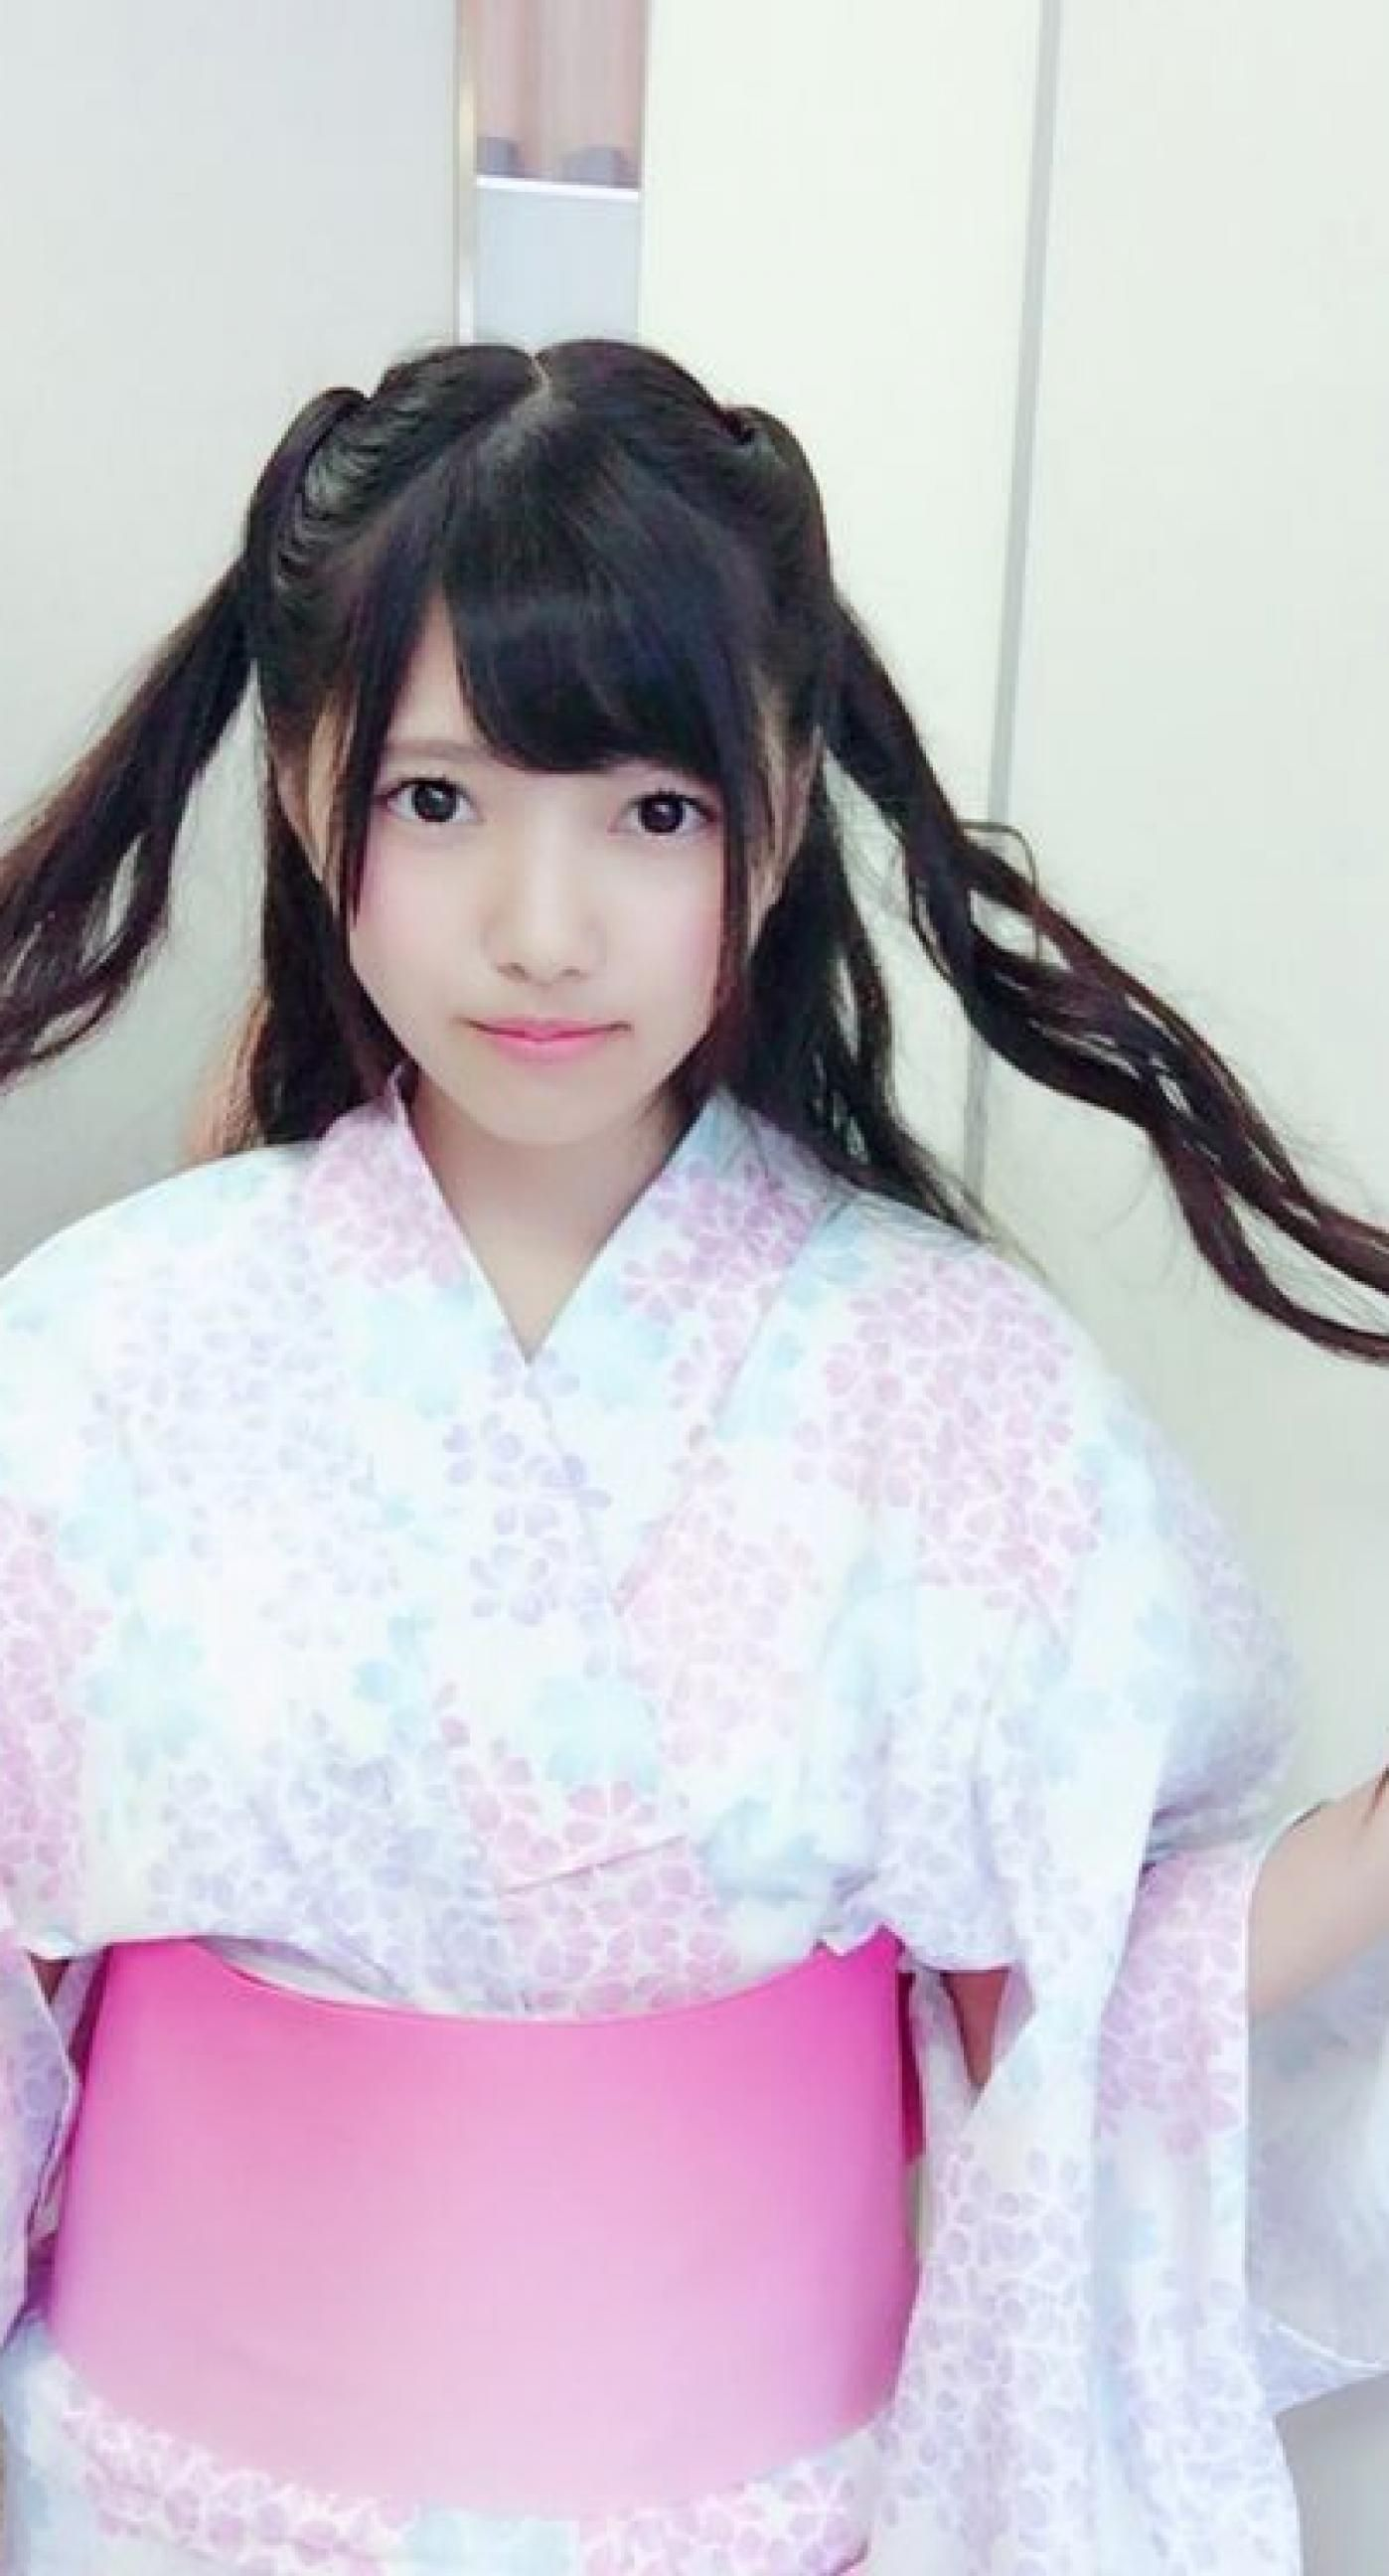 上村莉奈の着物画像